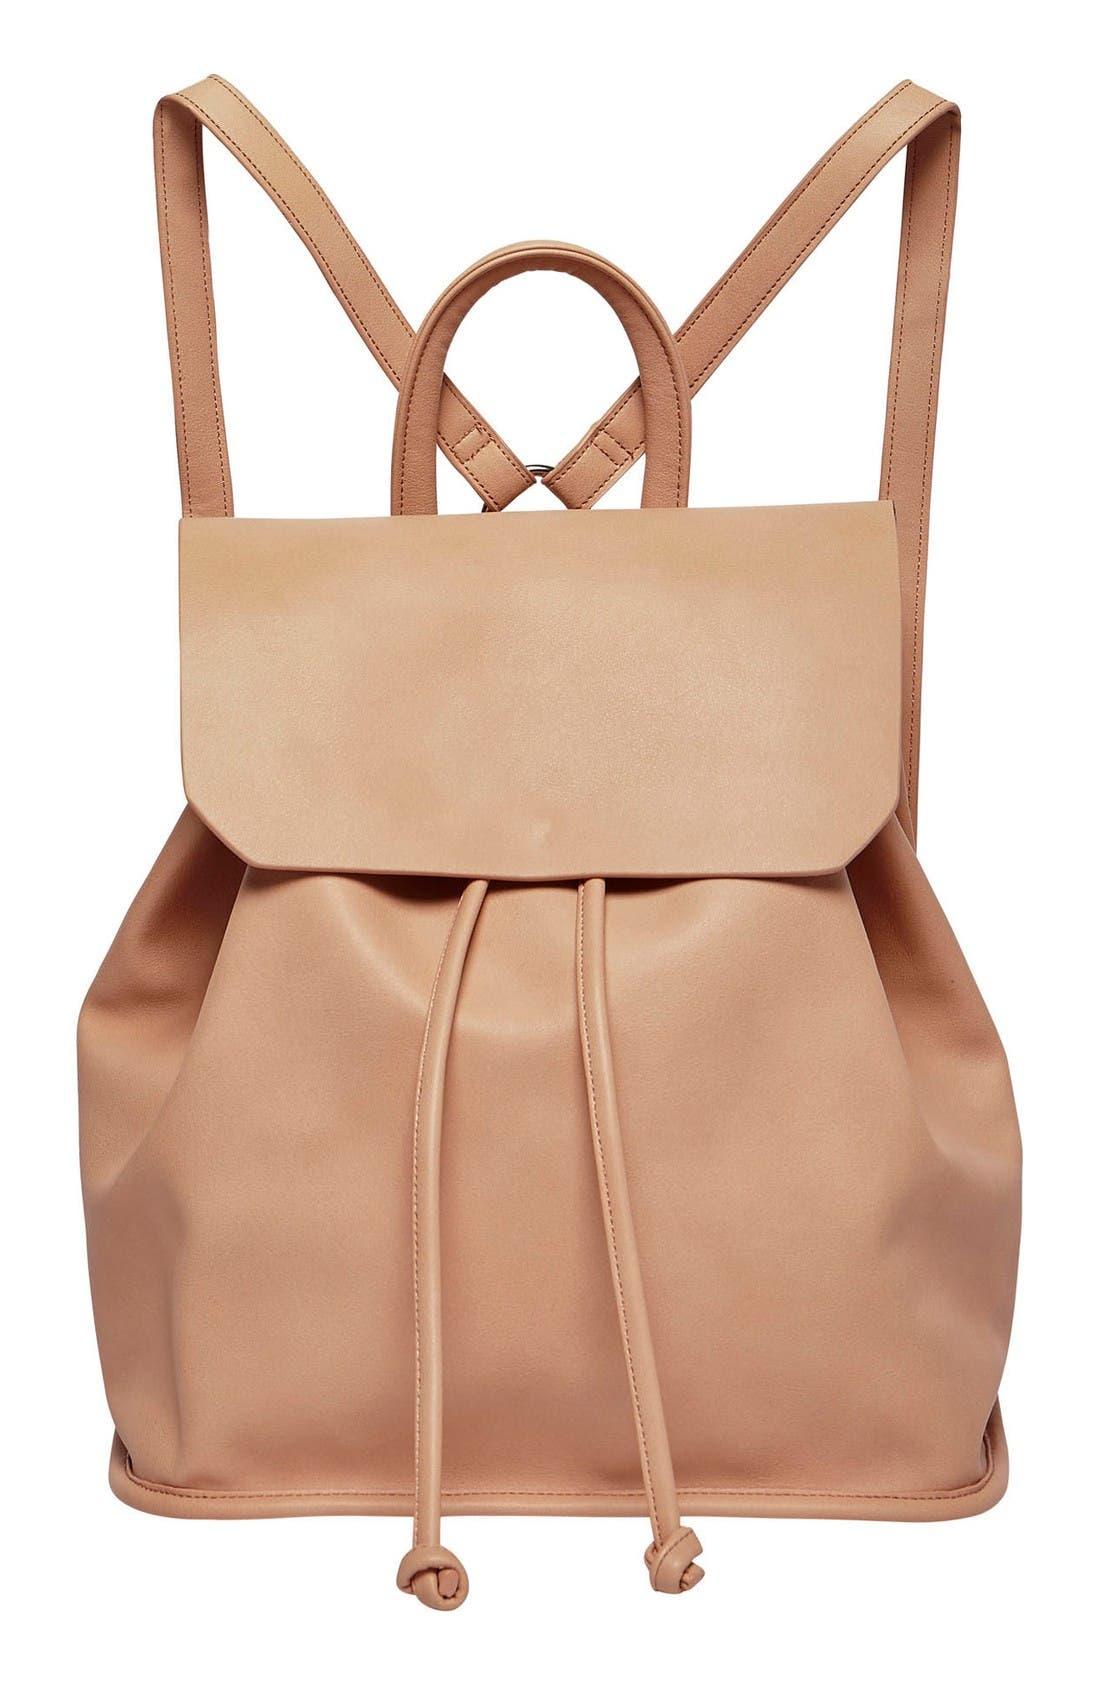 Main Image - Urban Originals Midnight Vegan Leather Flap Backpack